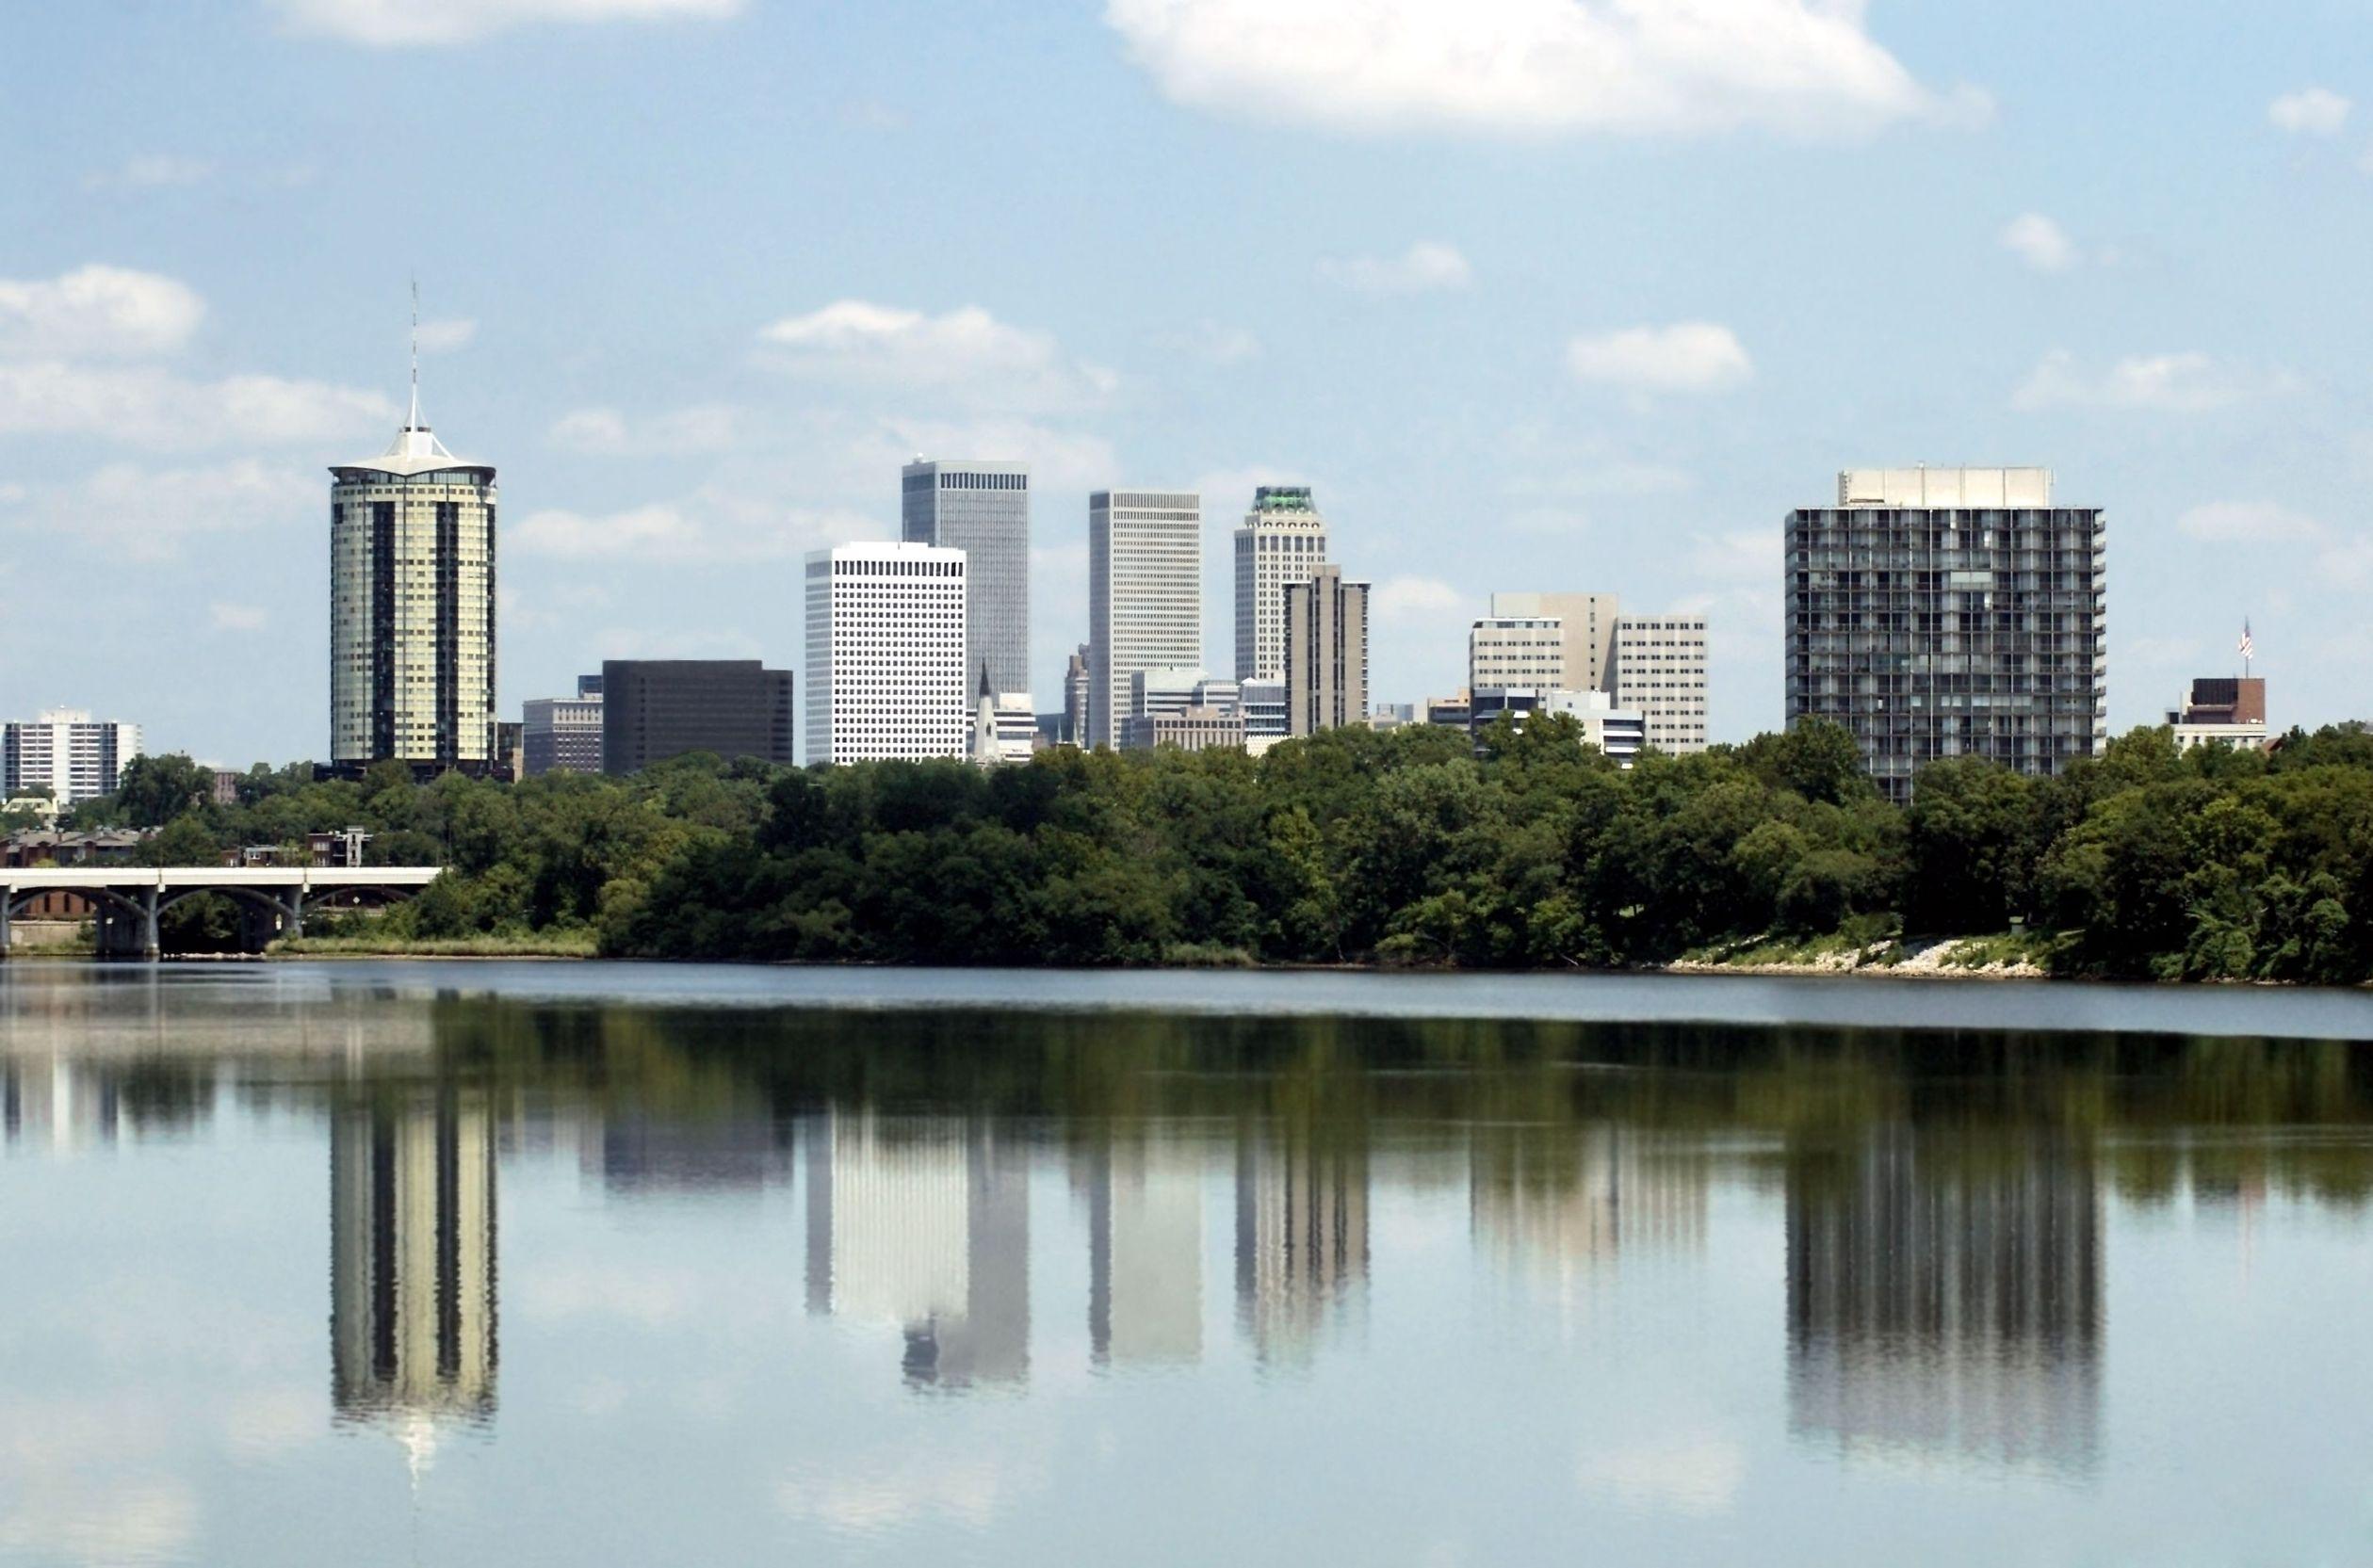 Moving to Tulsa